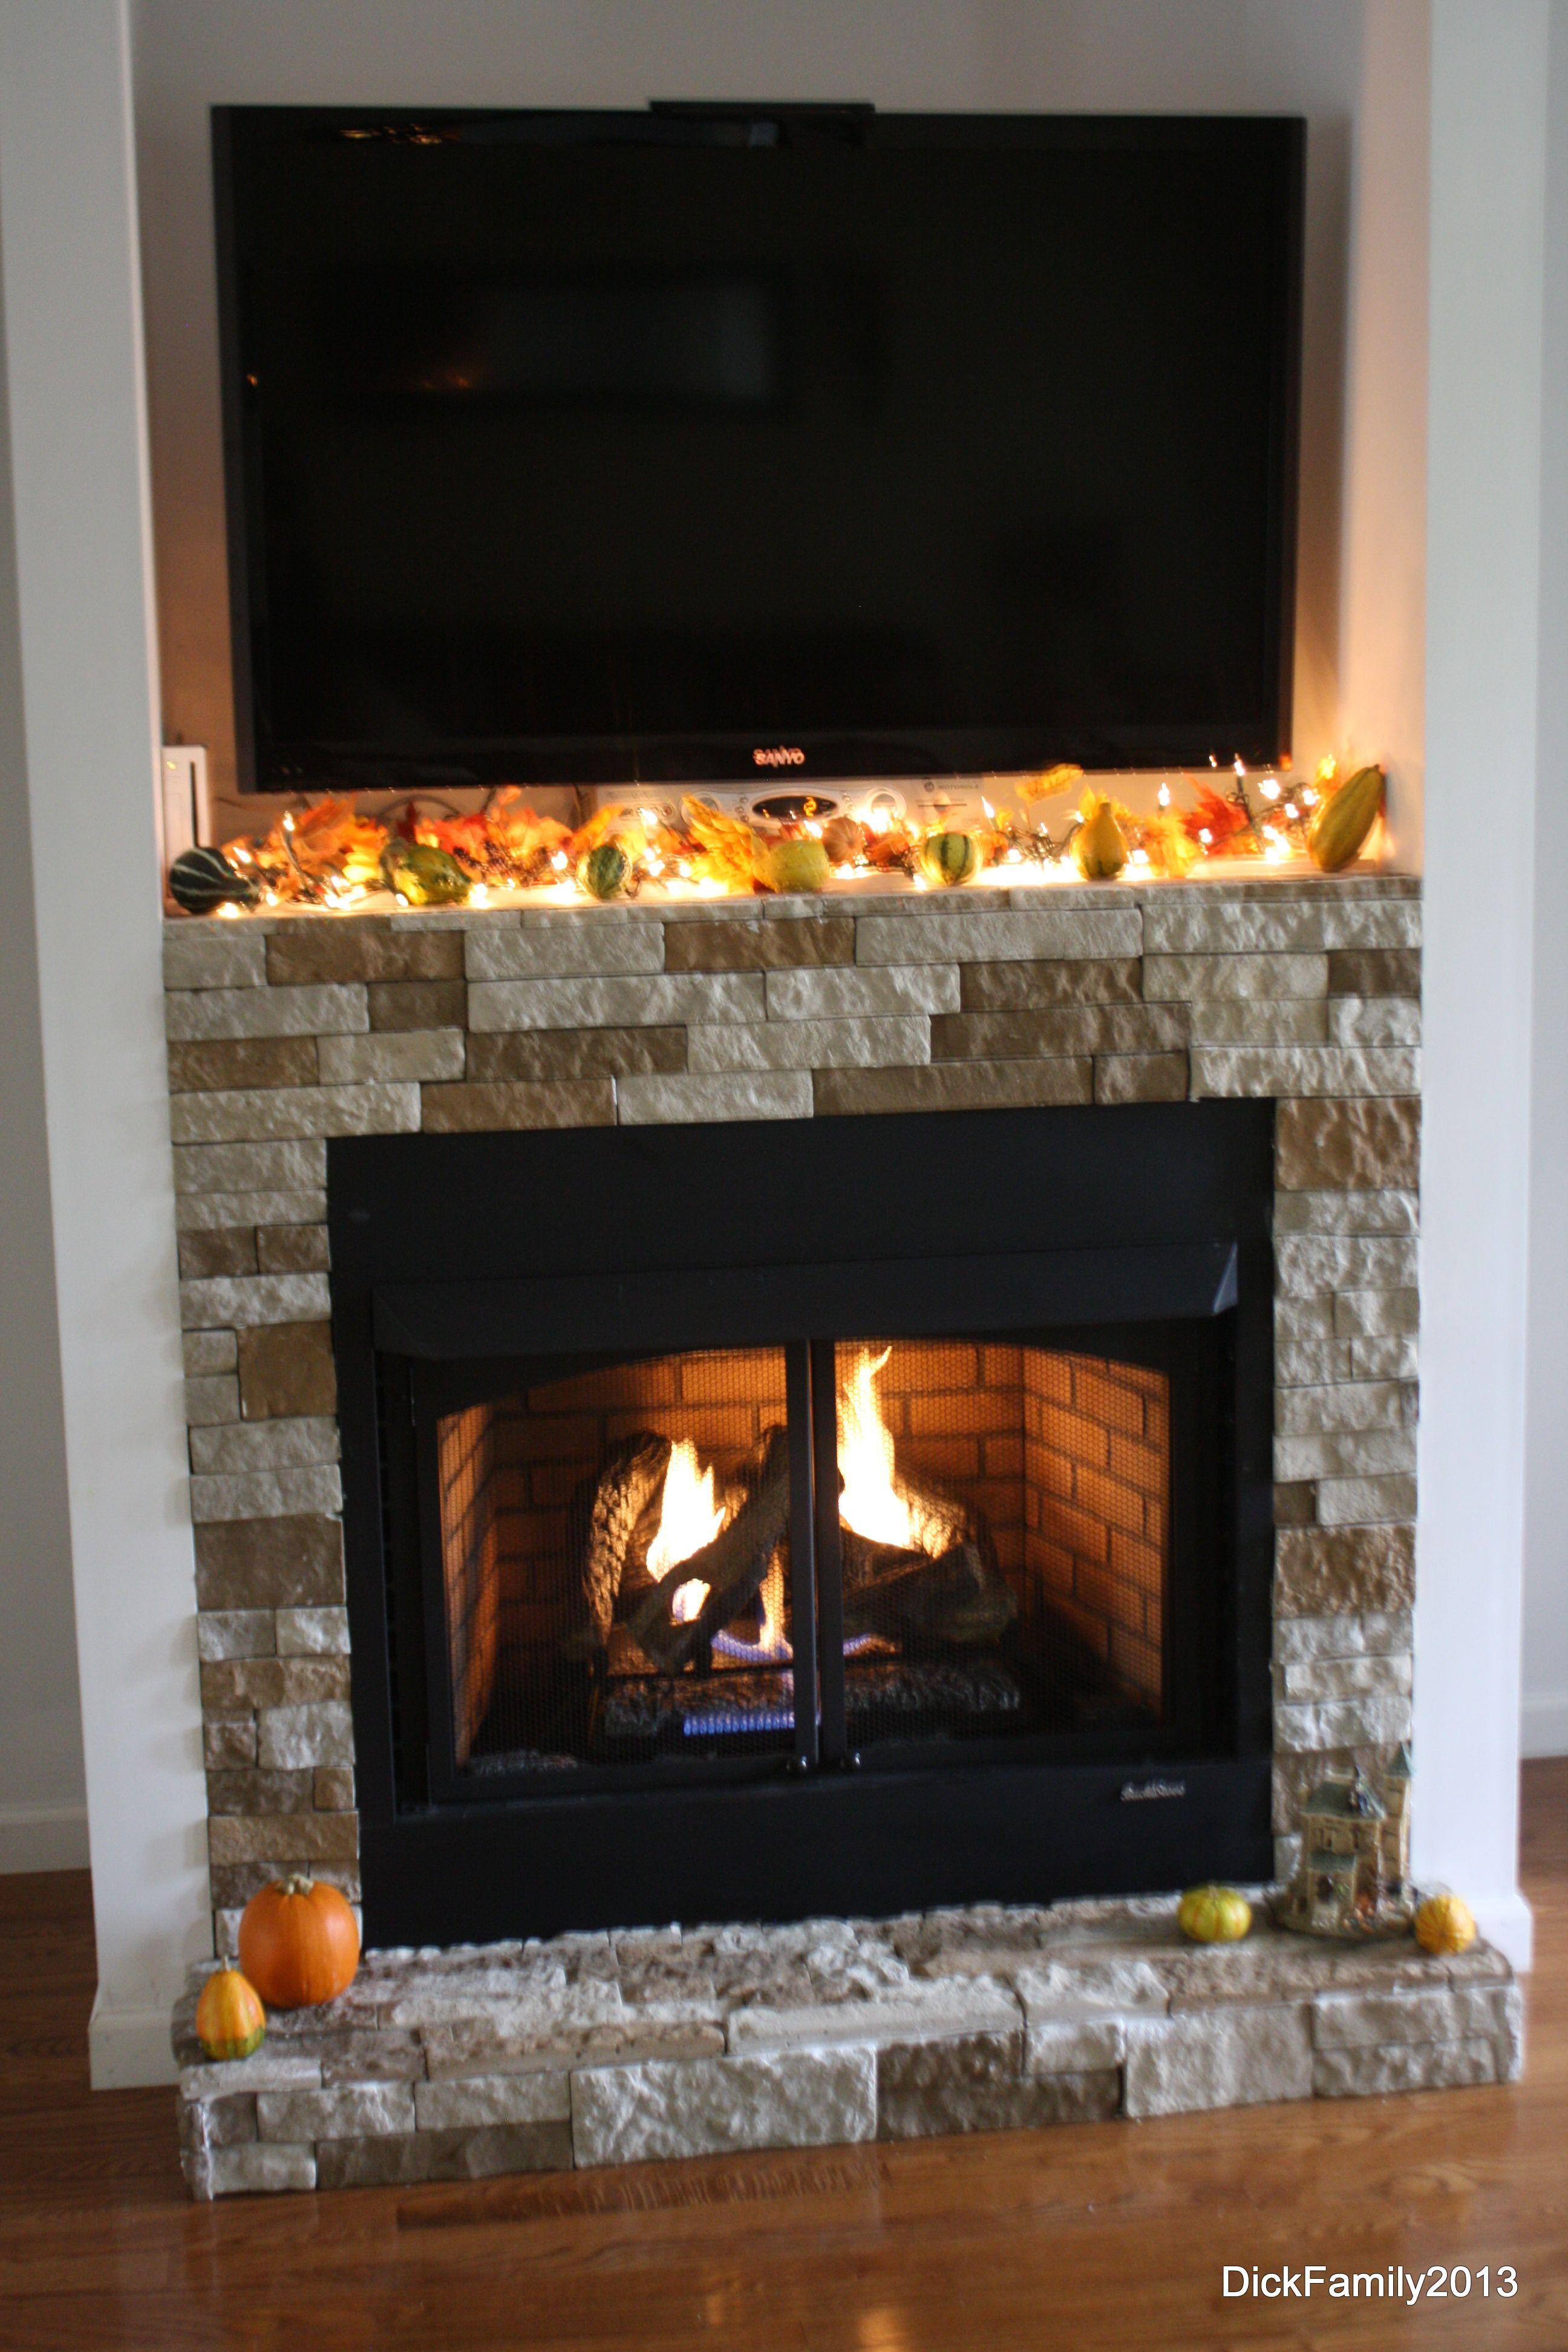 Adding A Fireplace Adding A Fireplace To A House Artificial Fireplace Best Fireplace I Wood Burning Fireplace Inserts Gas Fireplace Insert Vented Gas Fireplace